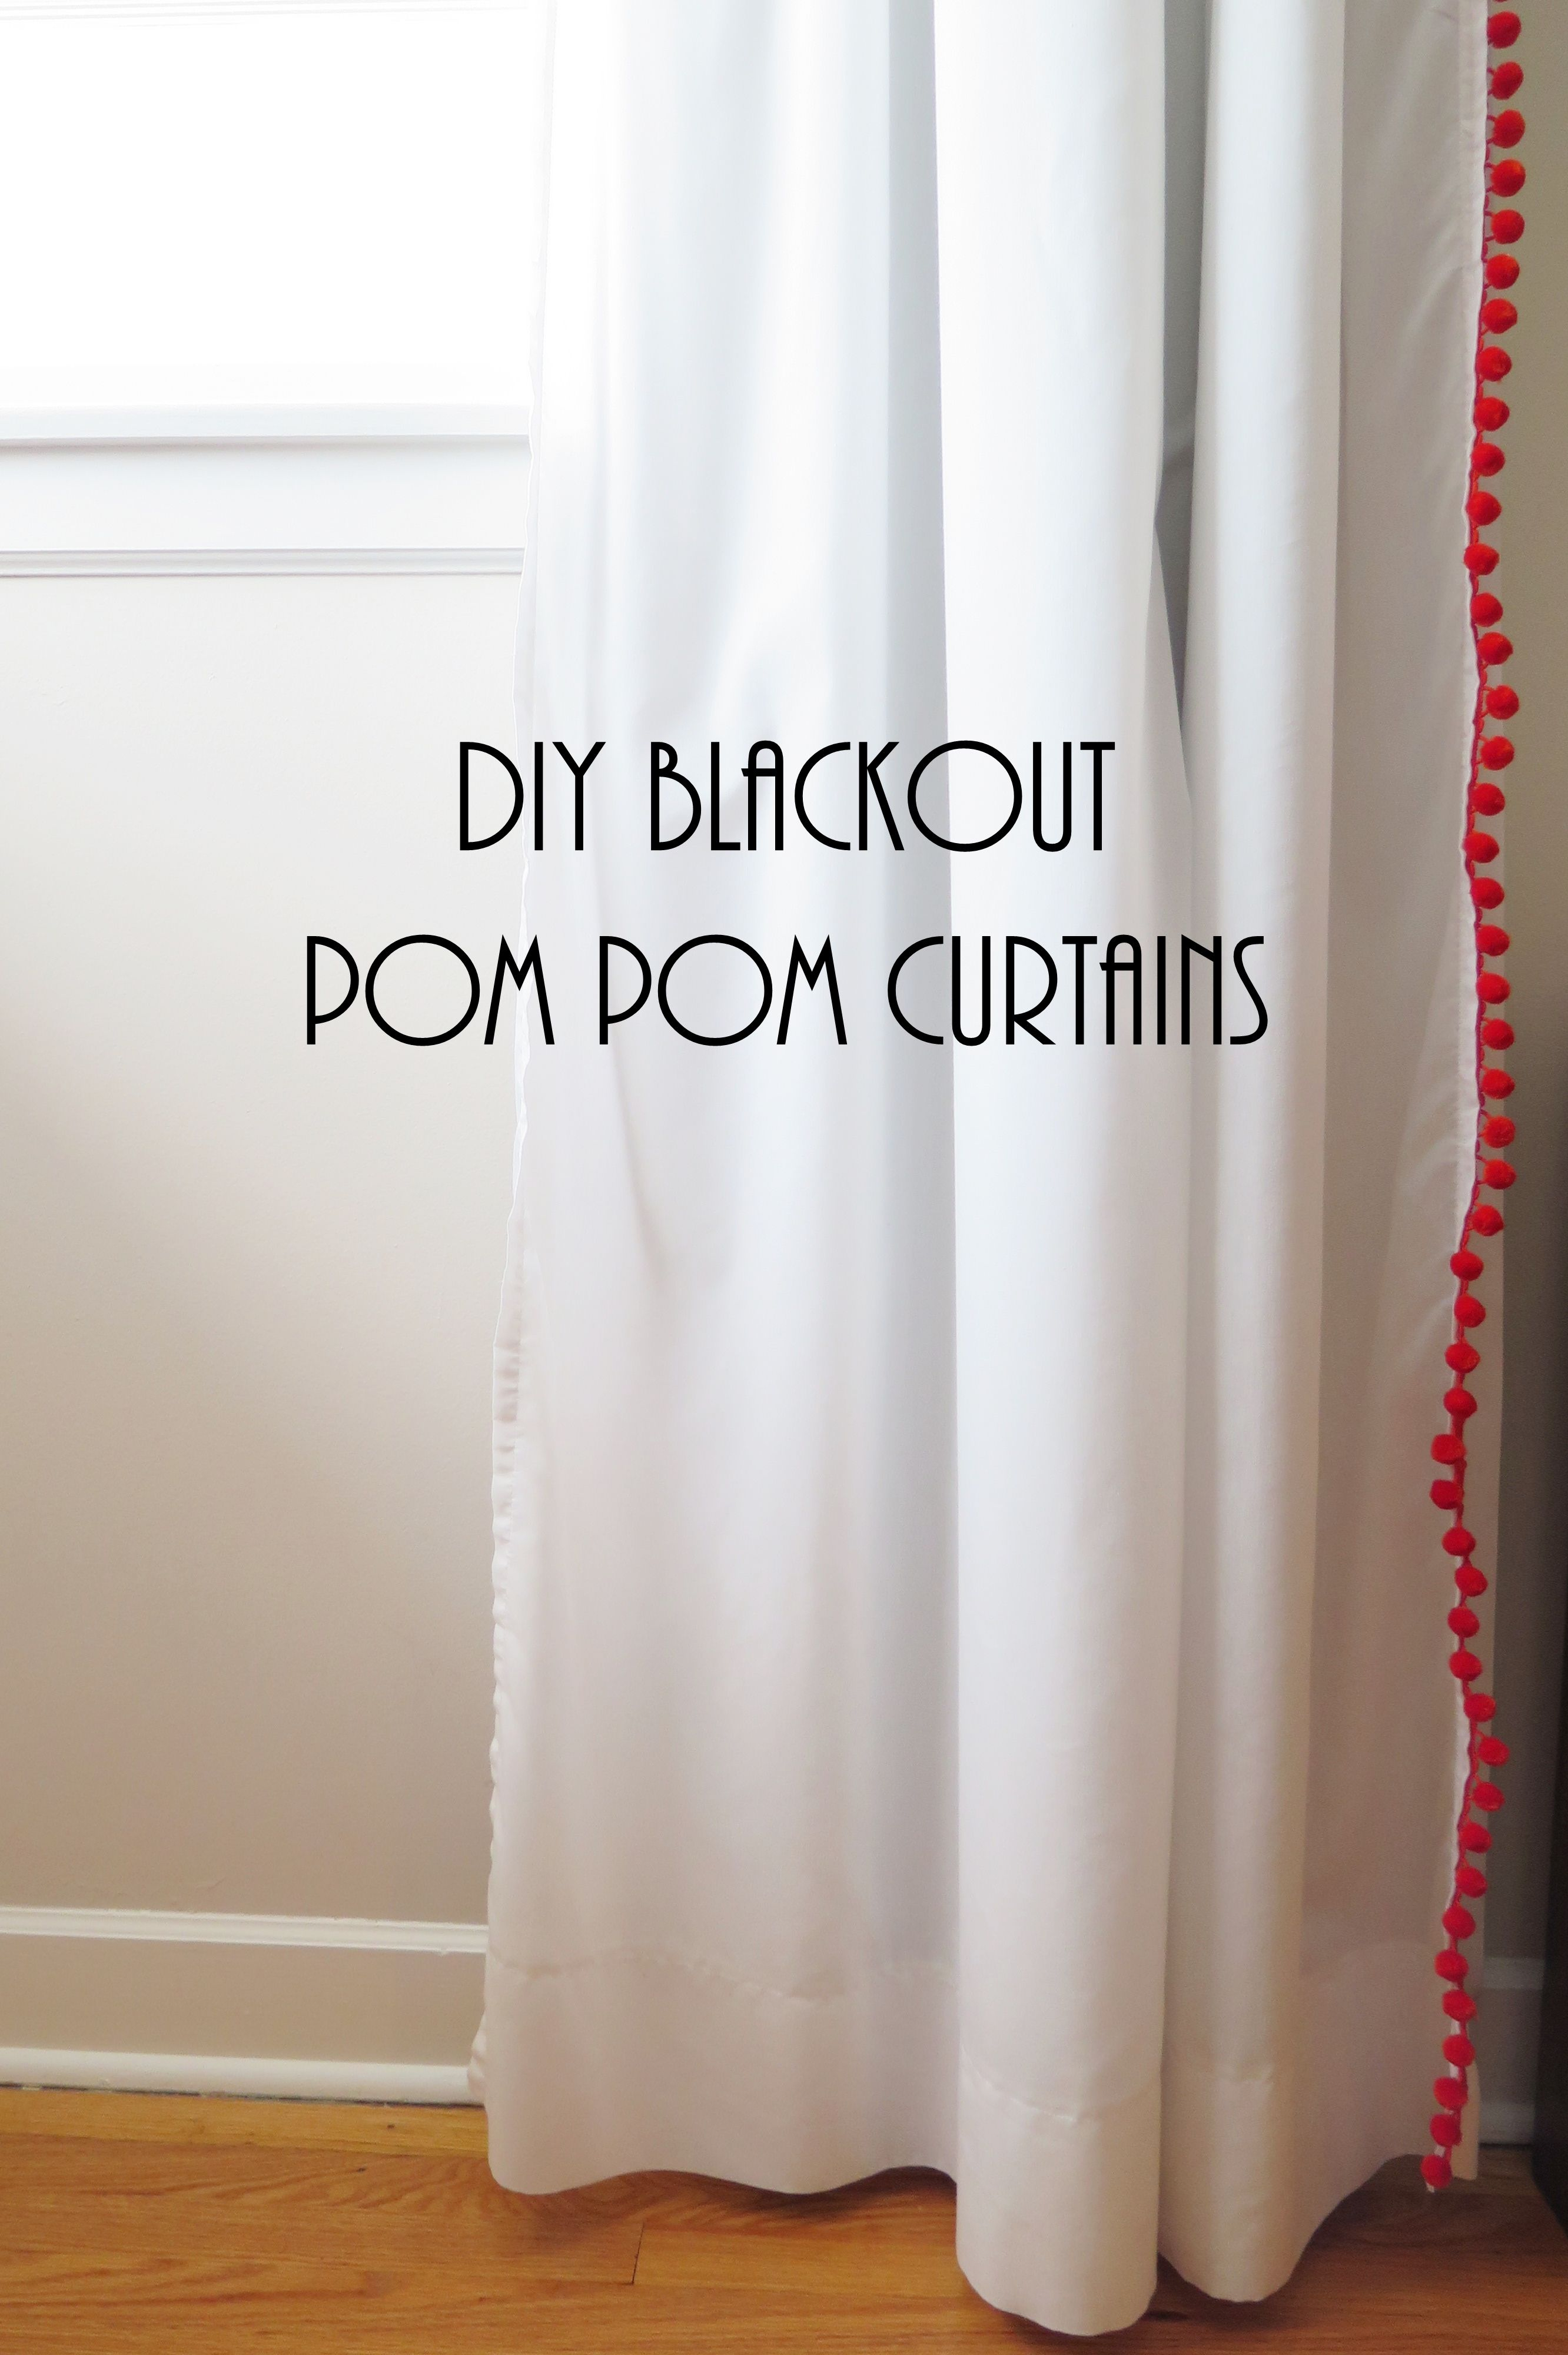 Blackout curtains for bedroom - Bedrooms Diy Blackout Pom Pom Curtains